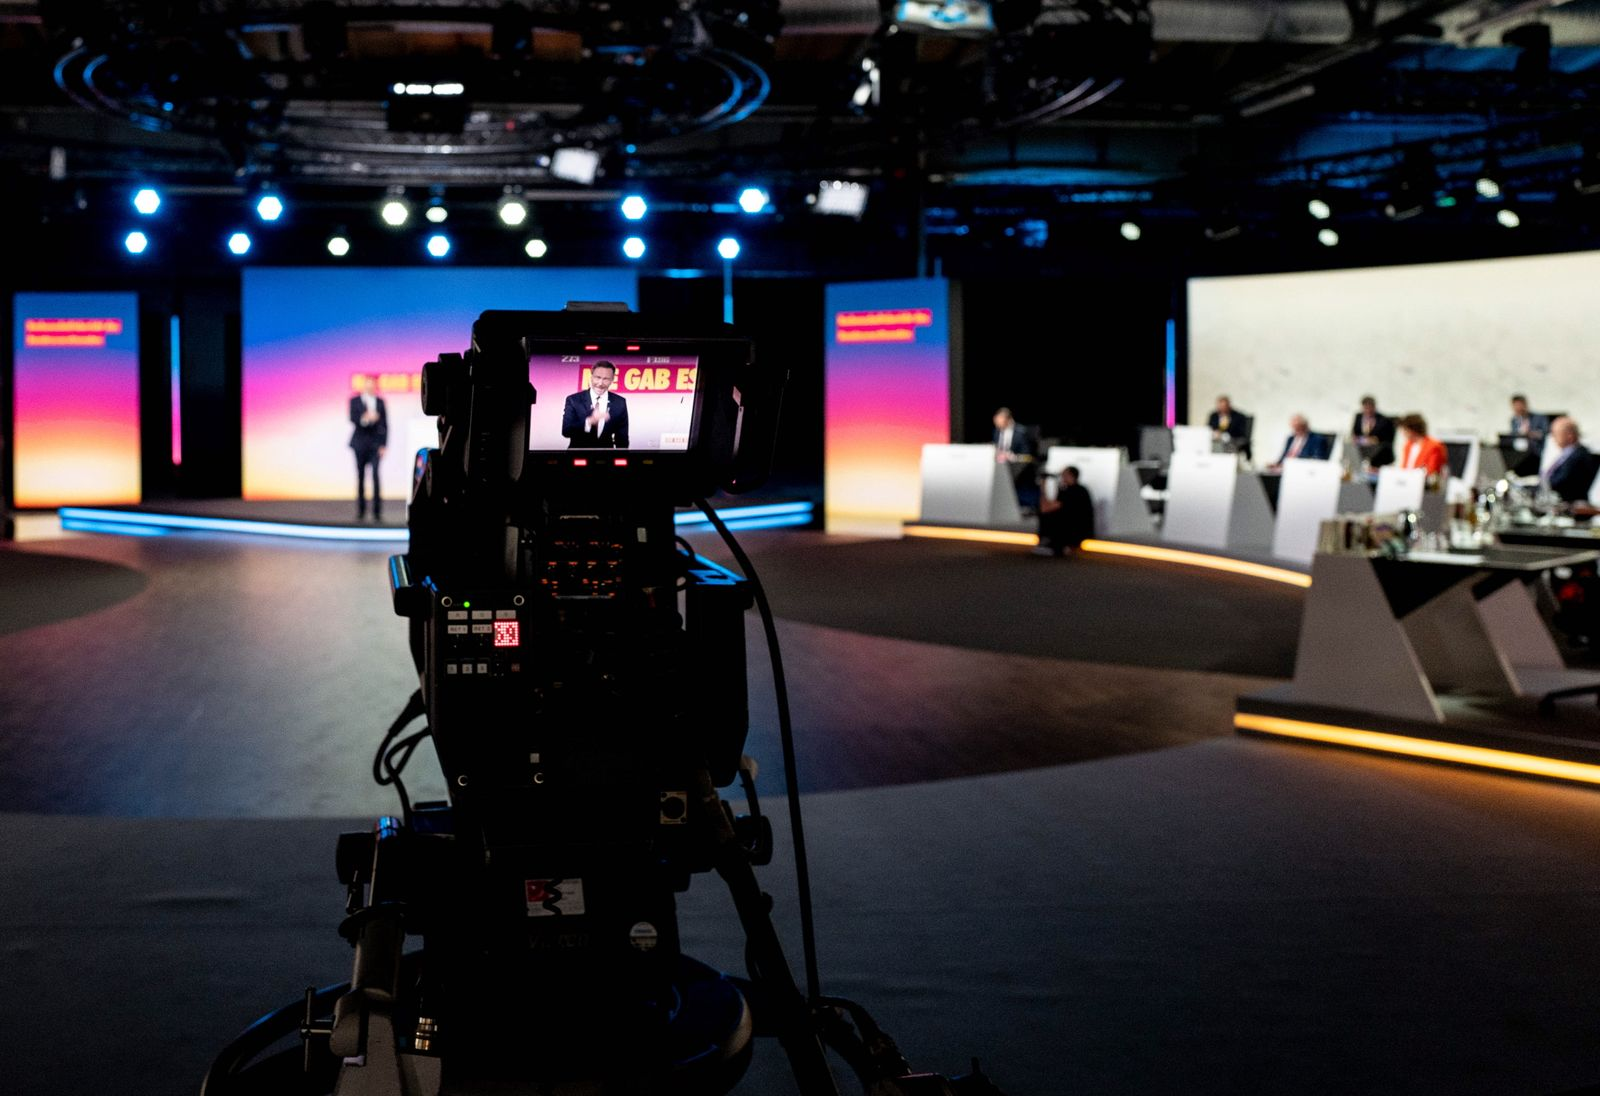 Extraordinary digital Free Democratic Party Convention